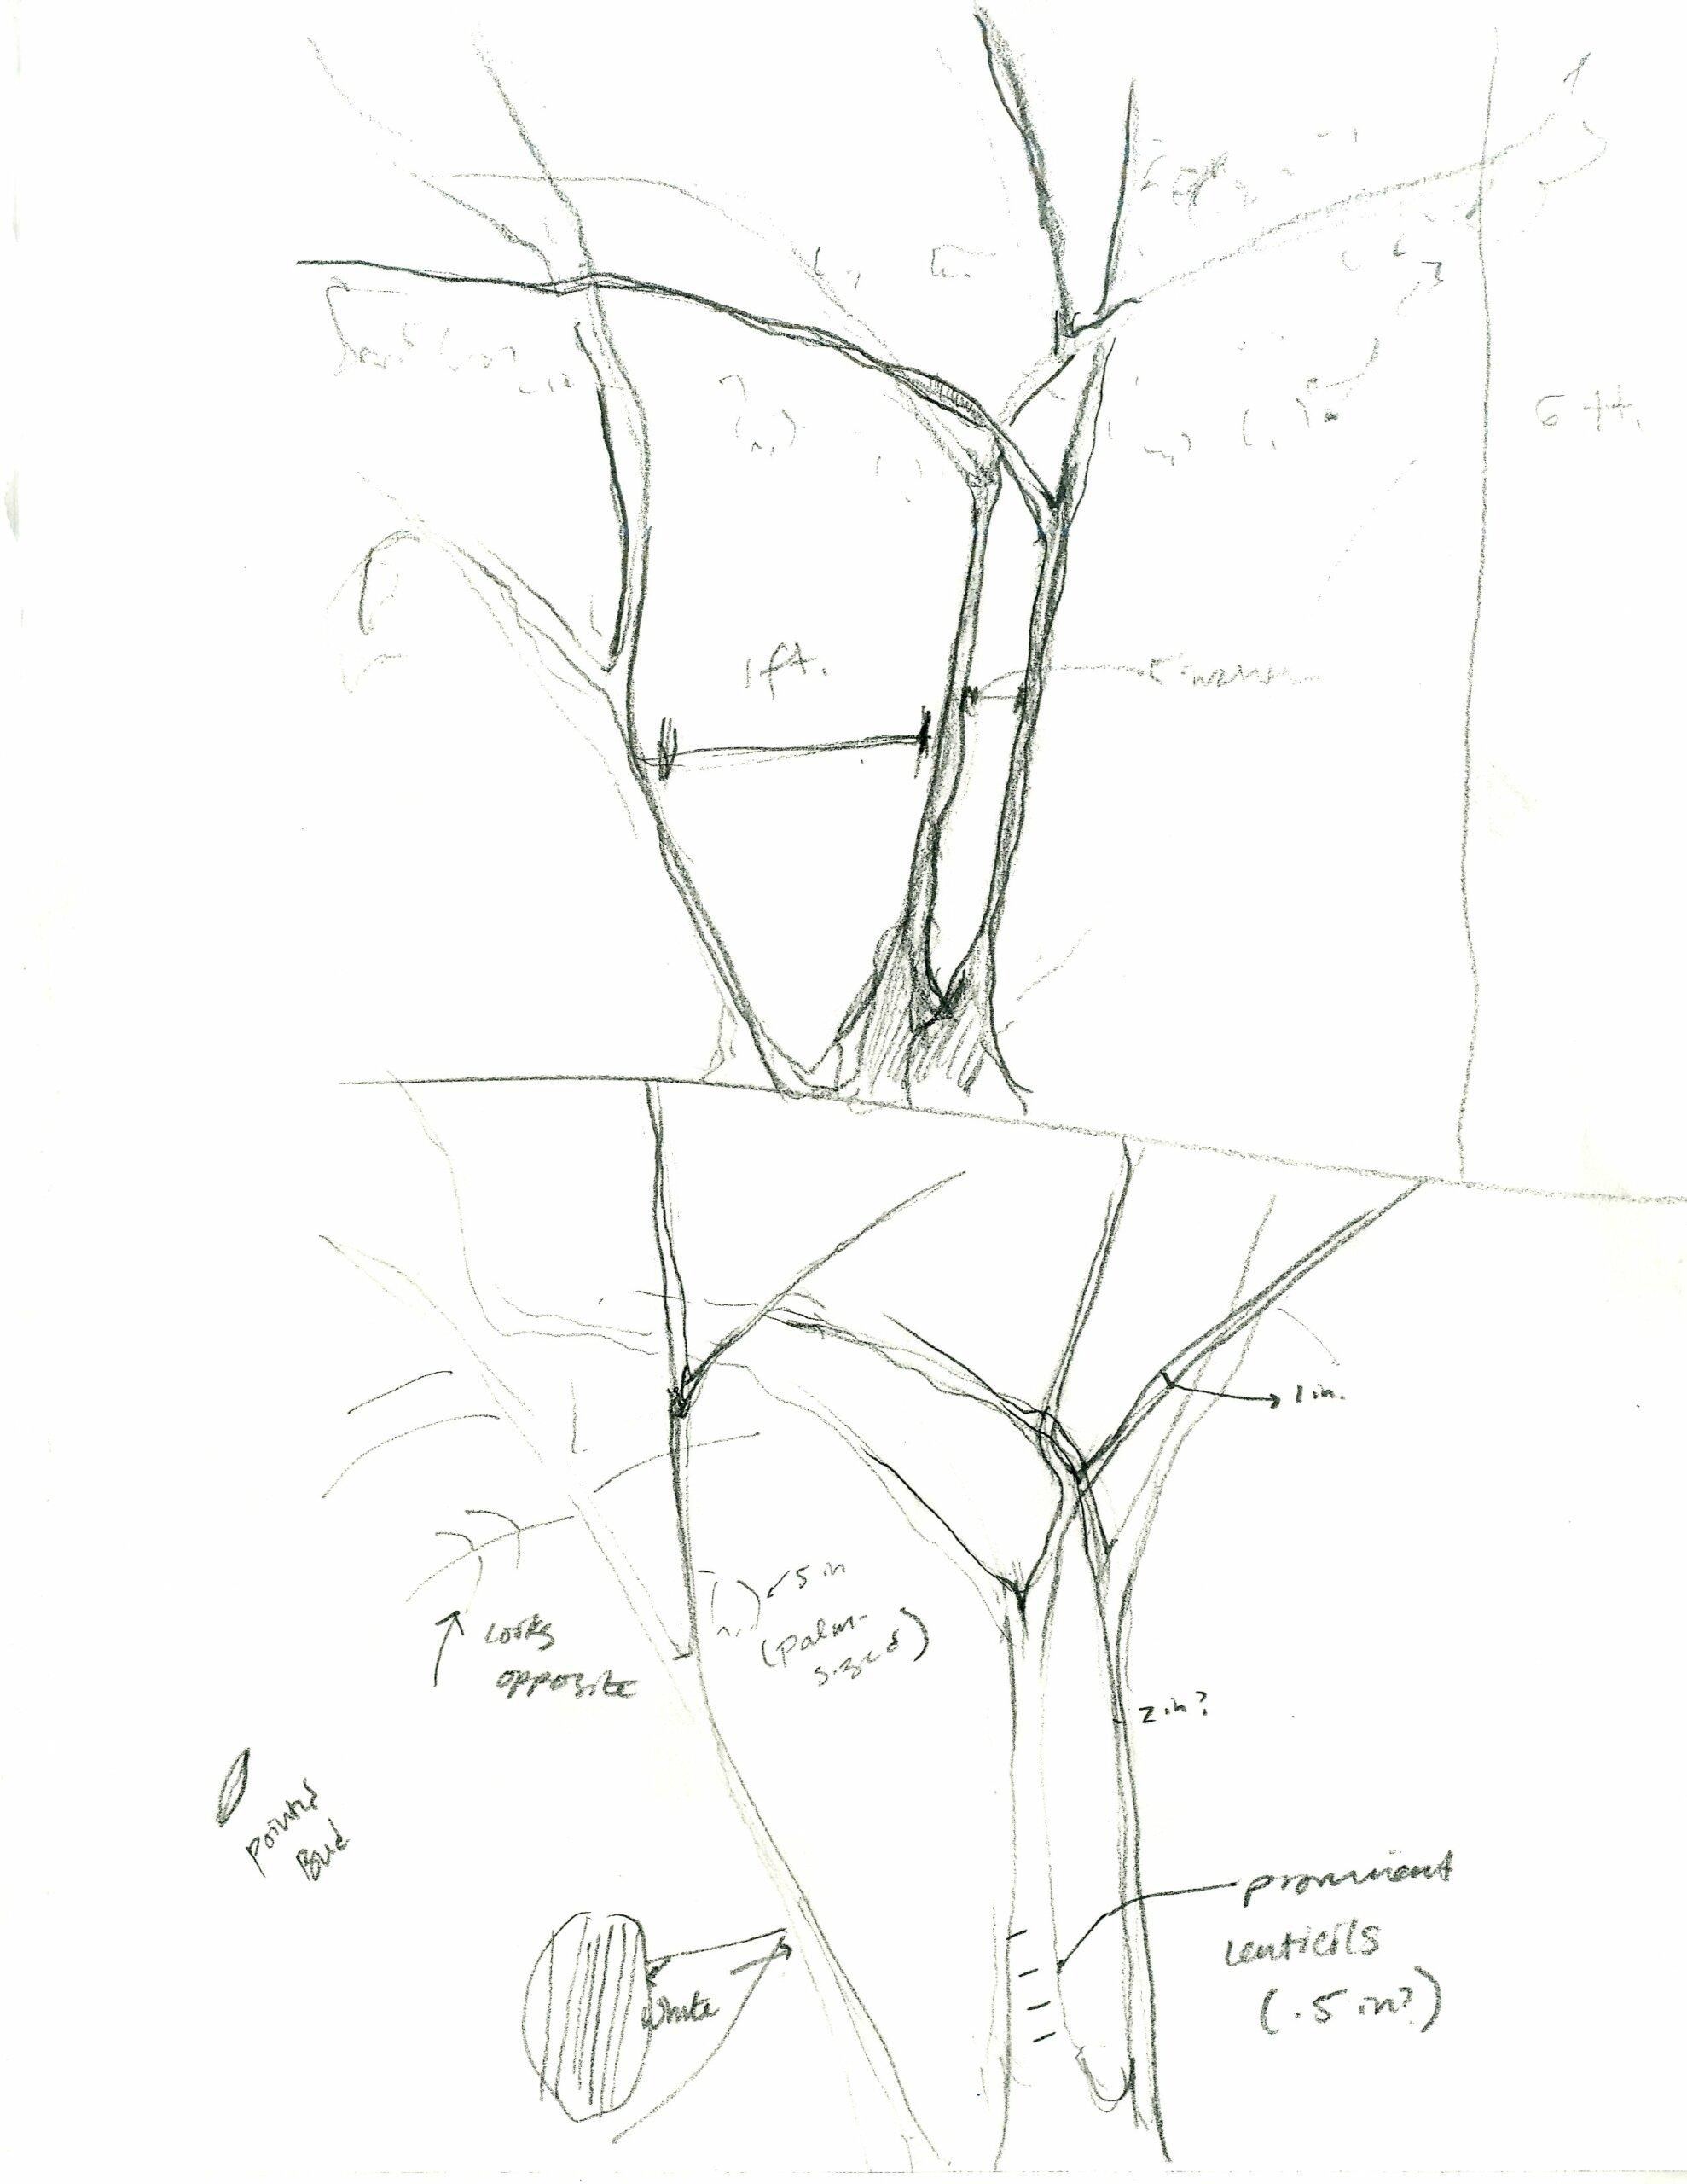 lynchann_136513_3037320_Lynch_Ann_Assignment 1_In Situ Diagram